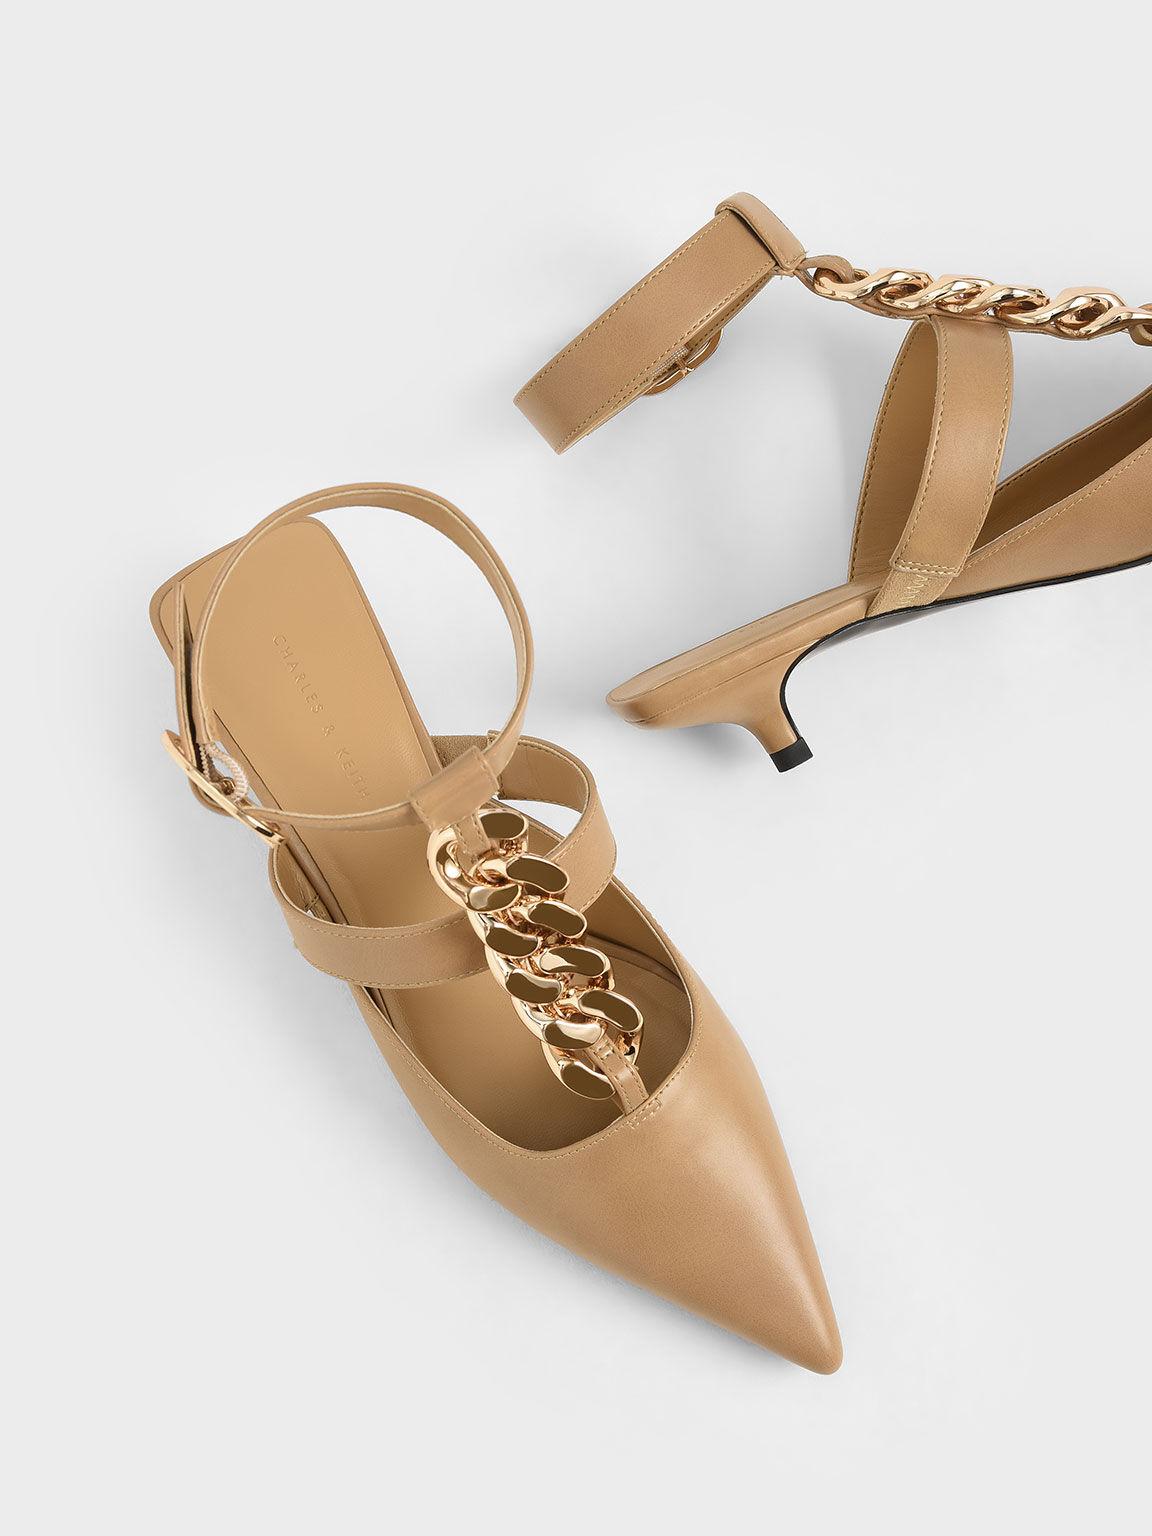 Chain Link Ankle Strap Court Shoes, Camel, hi-res